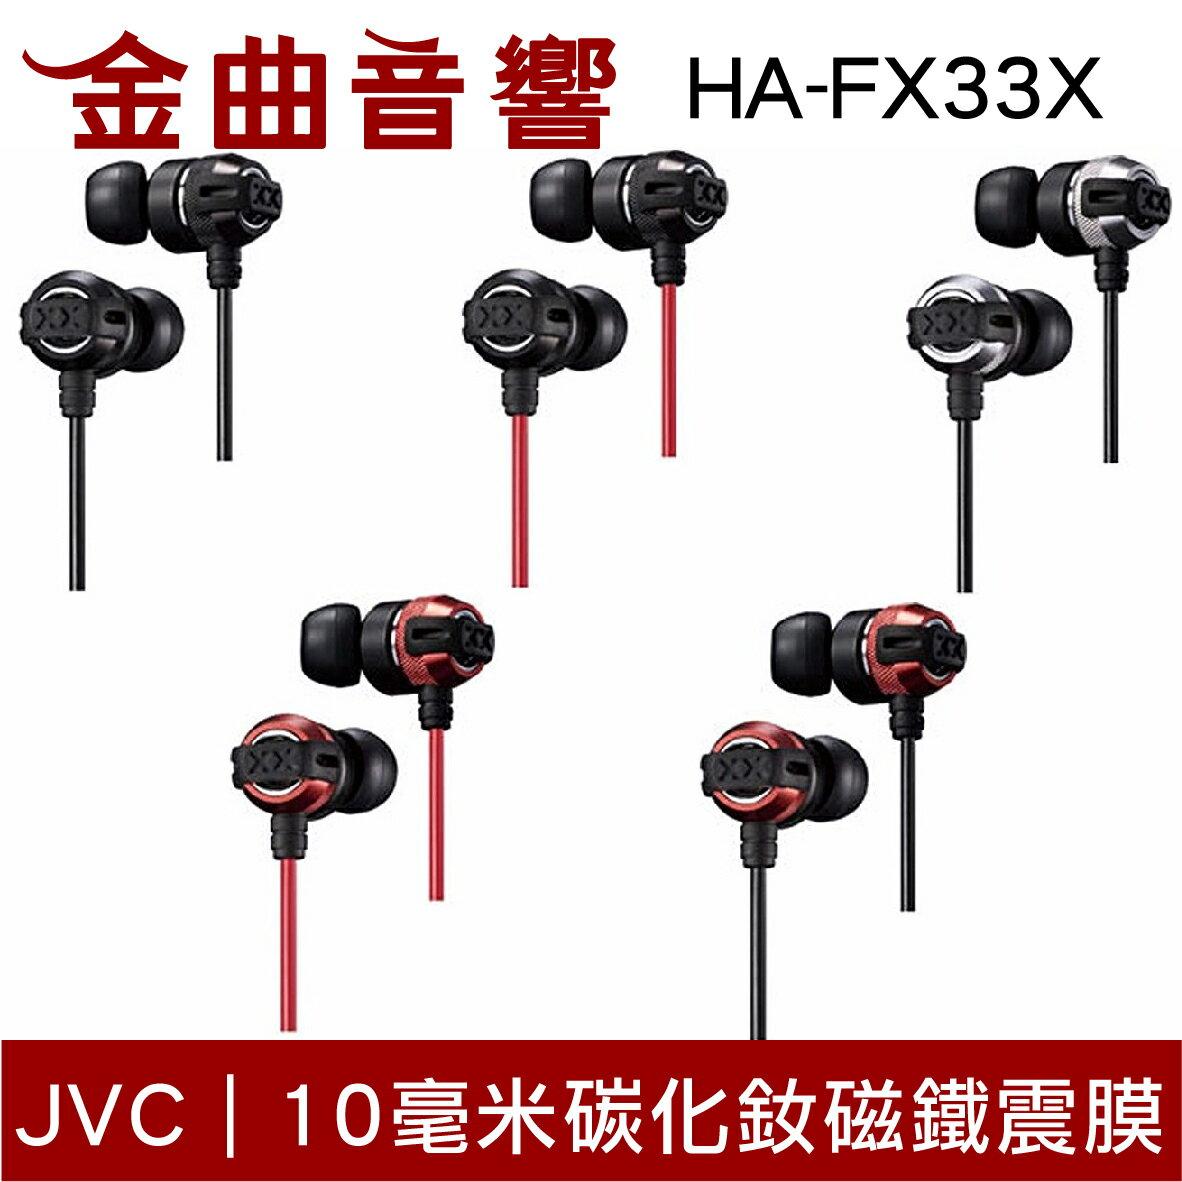 JVC 超重低音系列 HA-FX33X 噪音隔離 FX3X後繼款 | 金曲音響